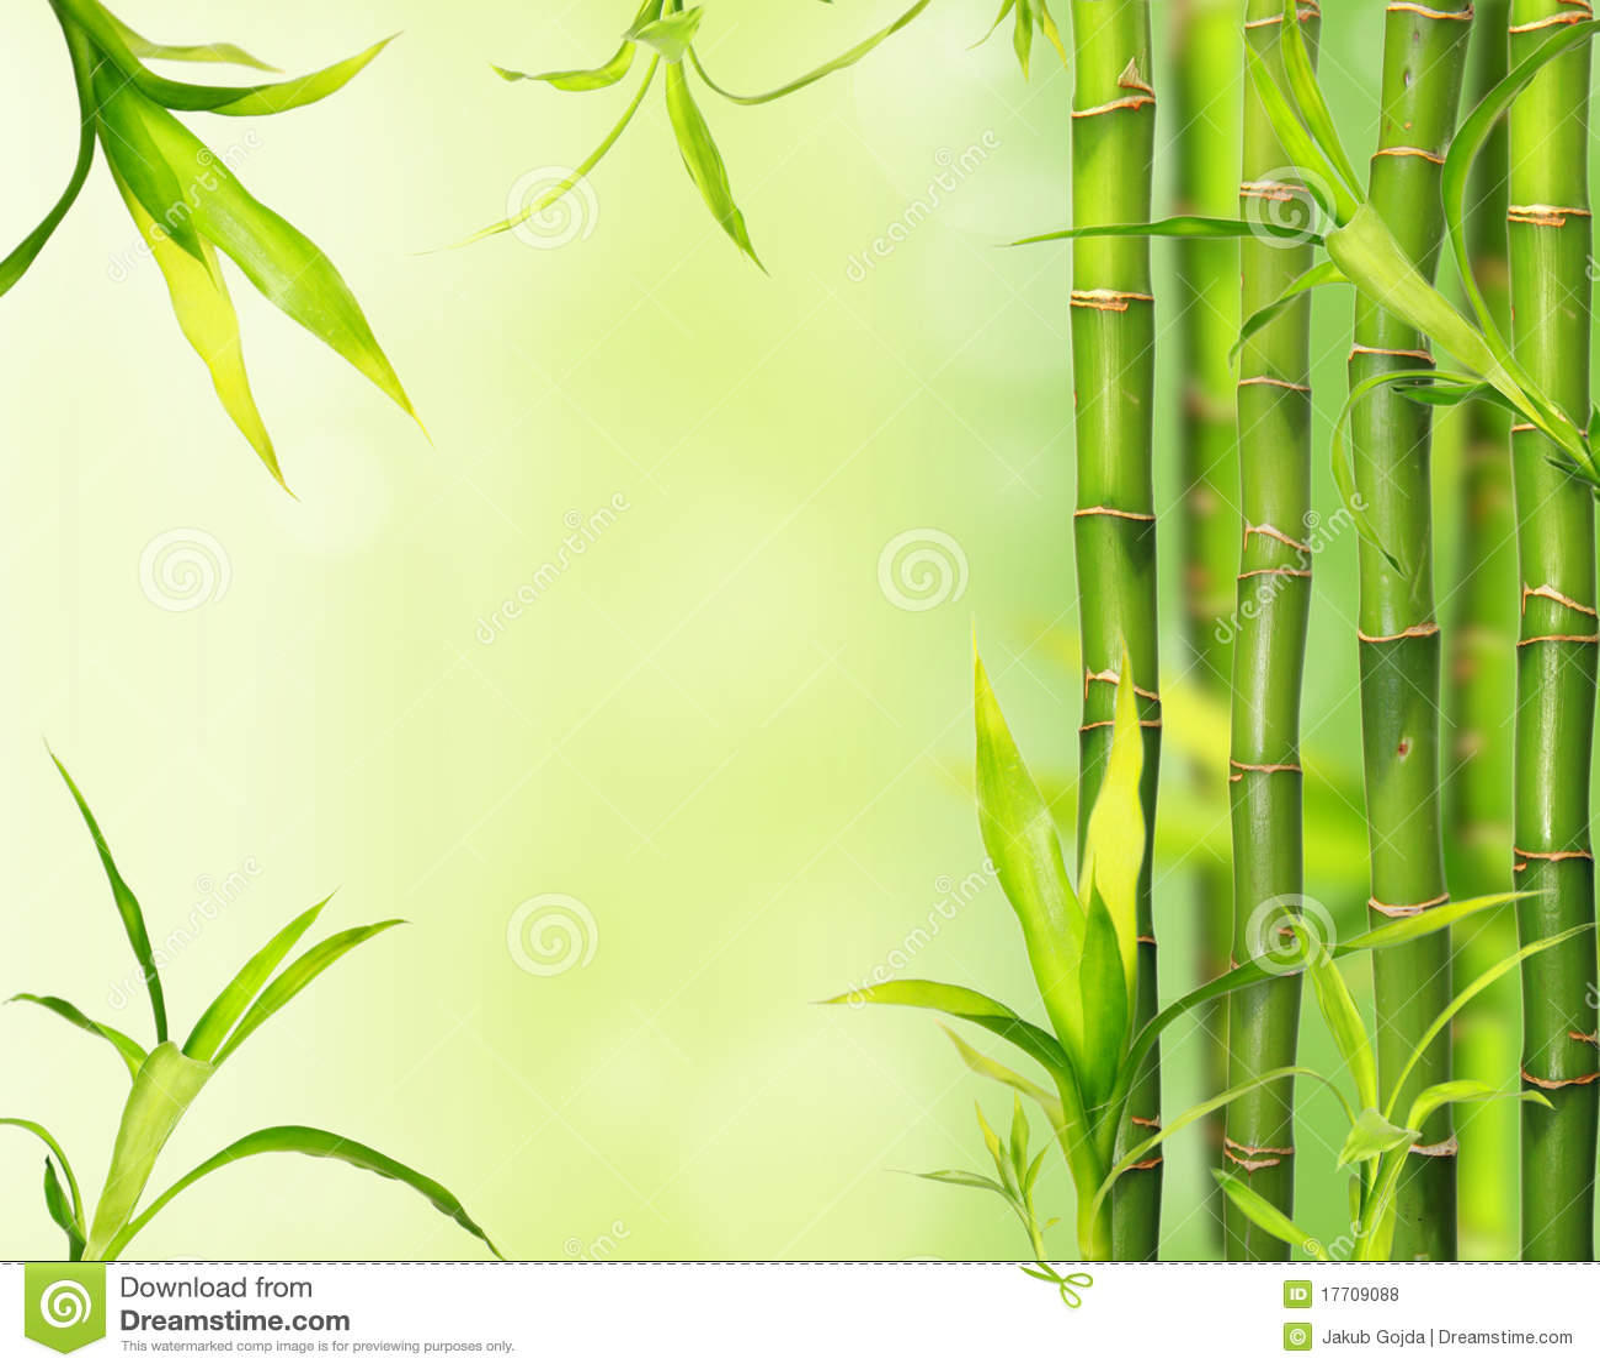 Bamboo Jungle Background Royalty Free Stock Photos - Image: 17709088